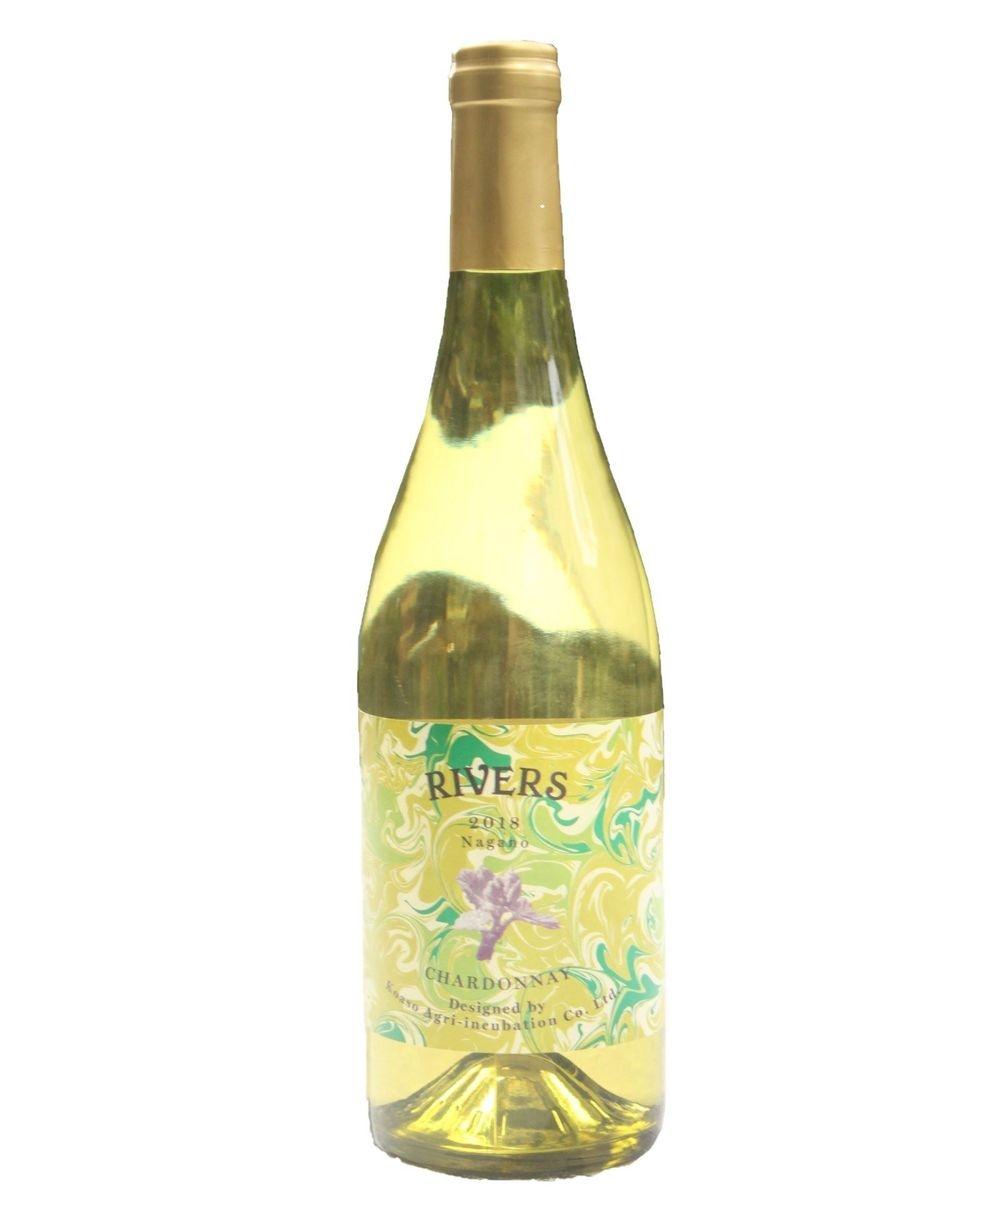 有機栽培葡萄 自社農園栽培葡萄100%使用 日本ワイン Nagano Wine Vineyard Chardonnay  Organic